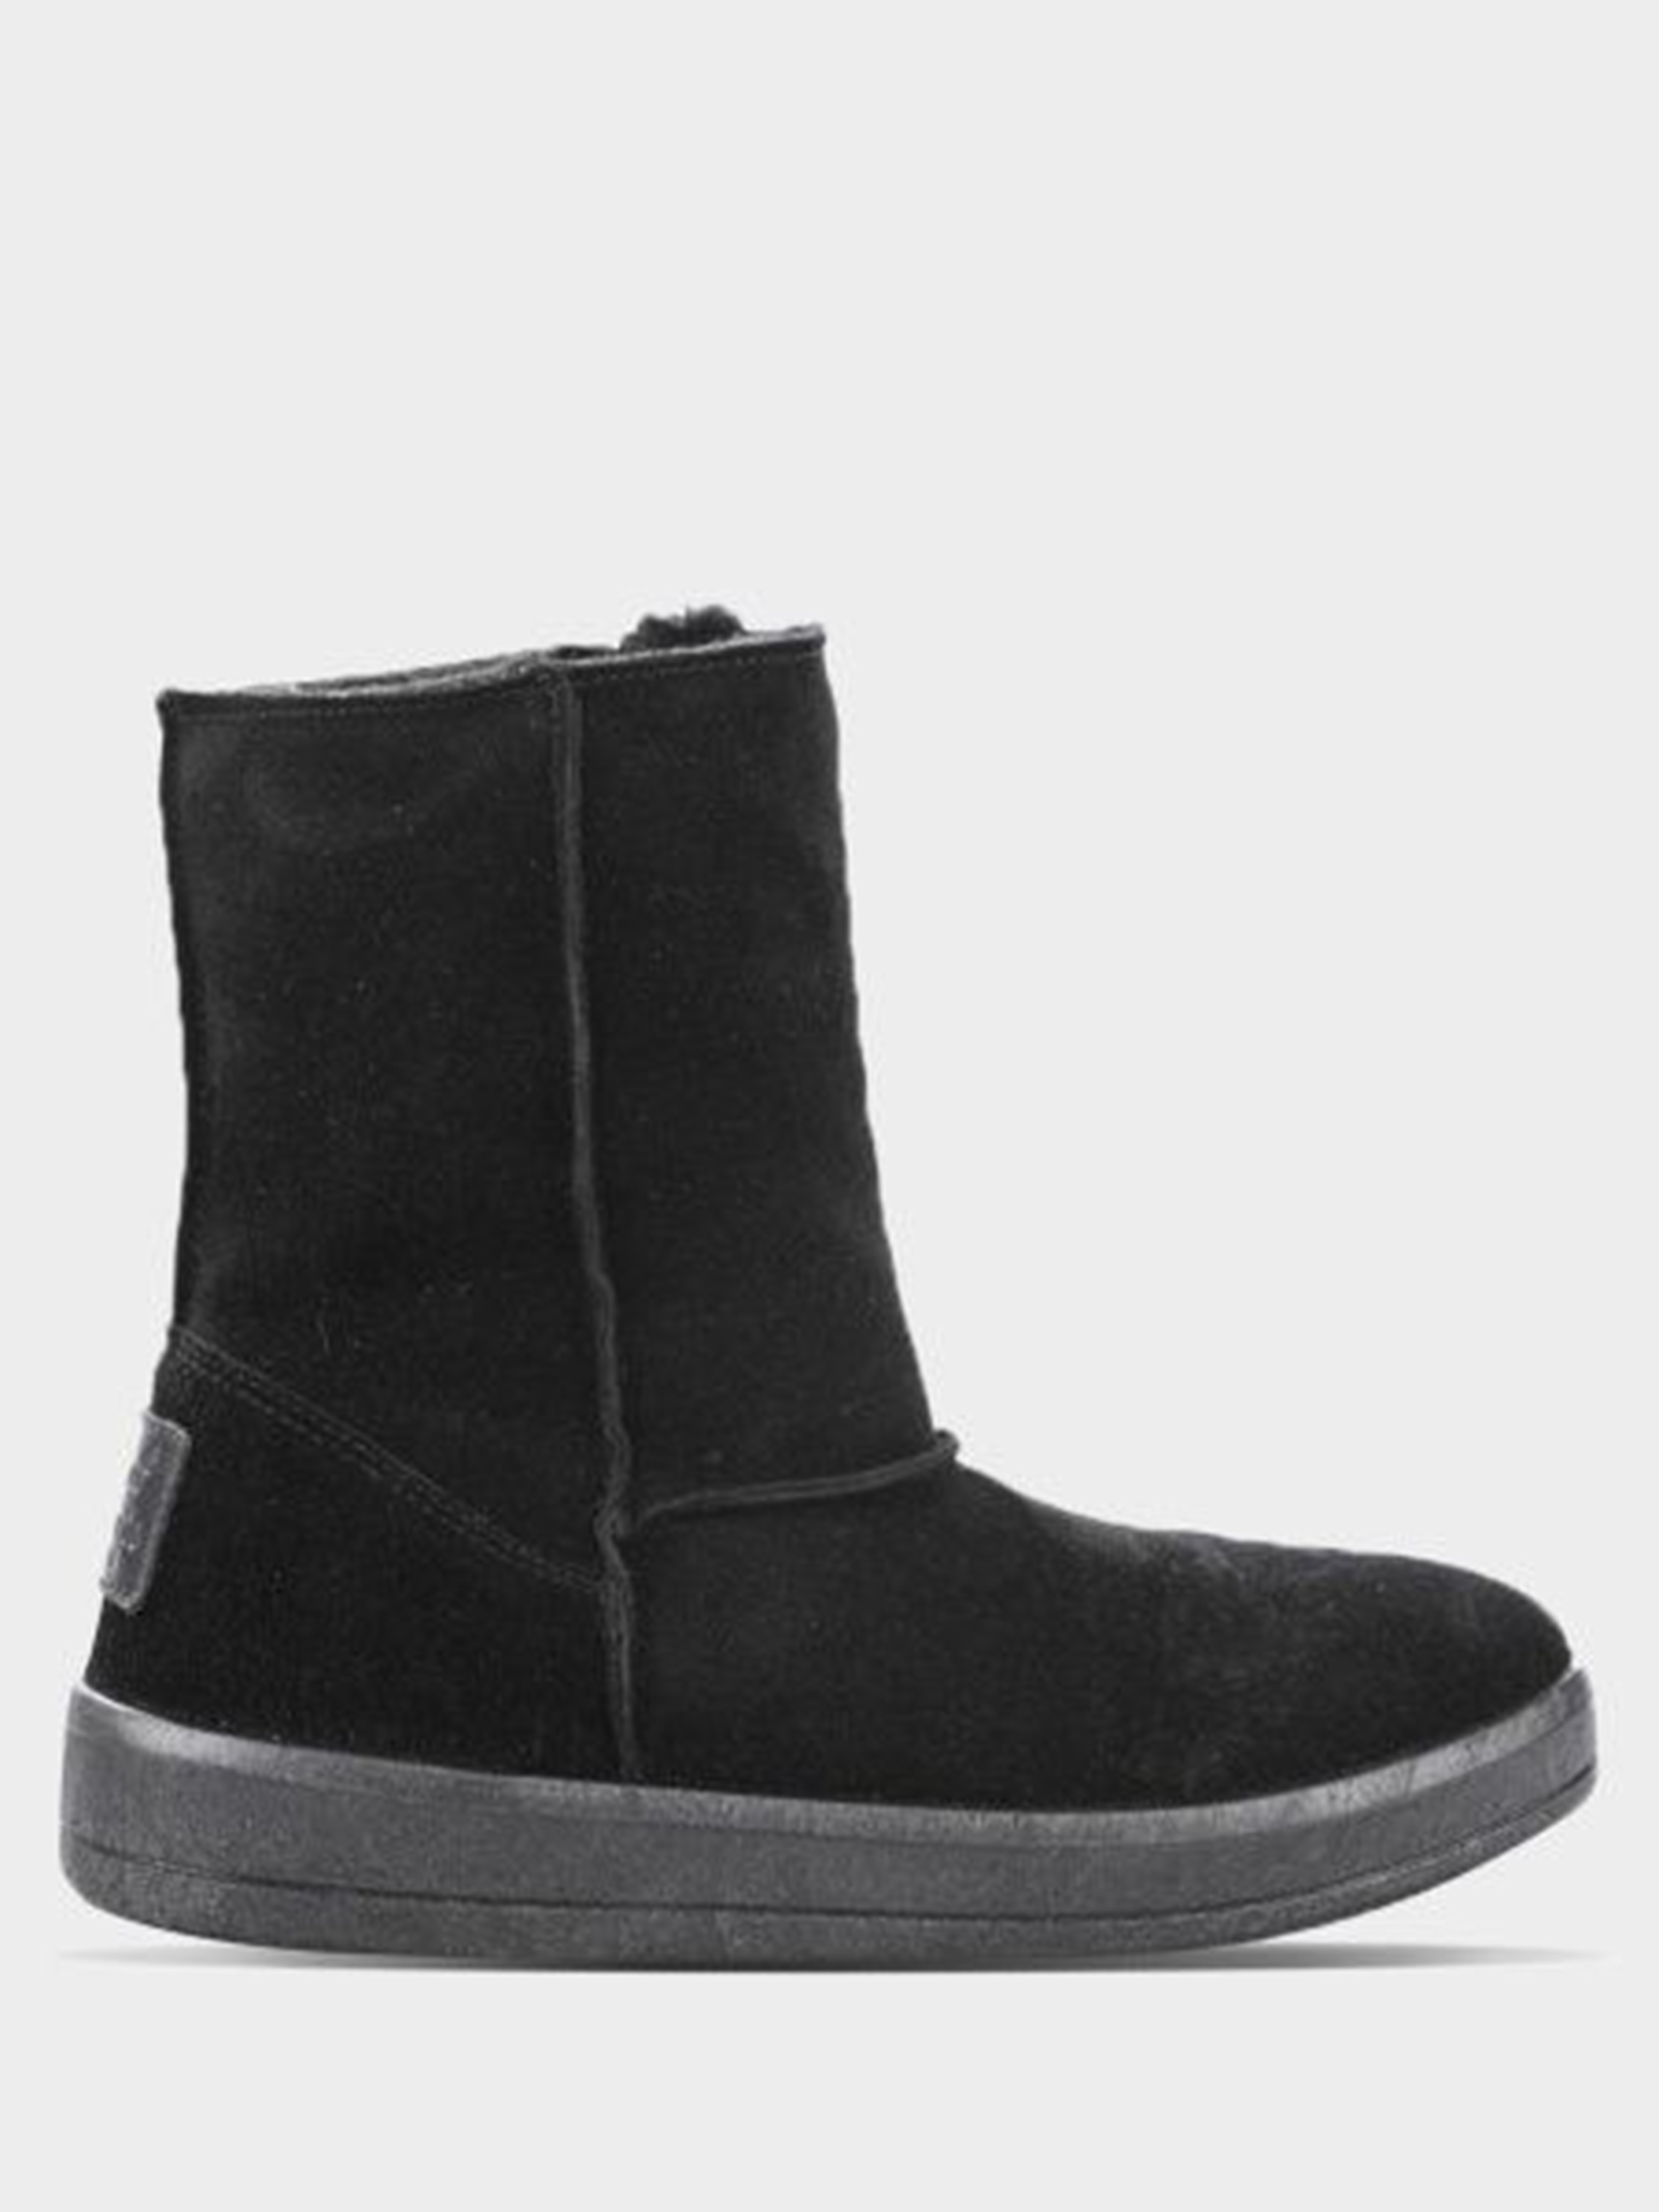 Ботинки женские Dino Vittorio 6H38 купить в Интертоп, 2017